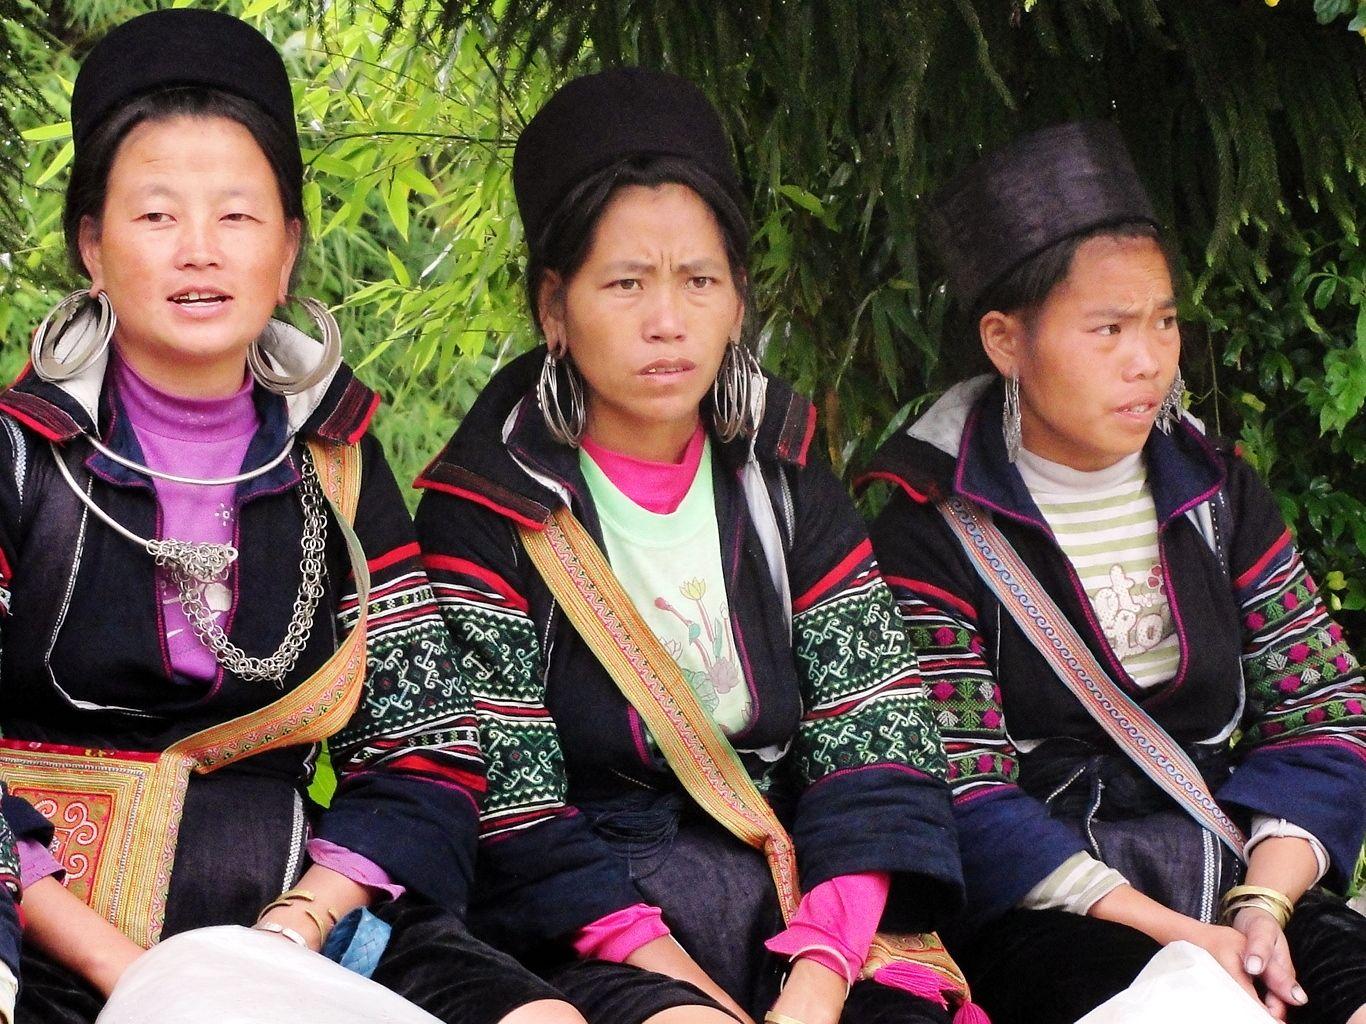 Pamiers. Cathou Quivy raconte sa rencontre avec les Hmong